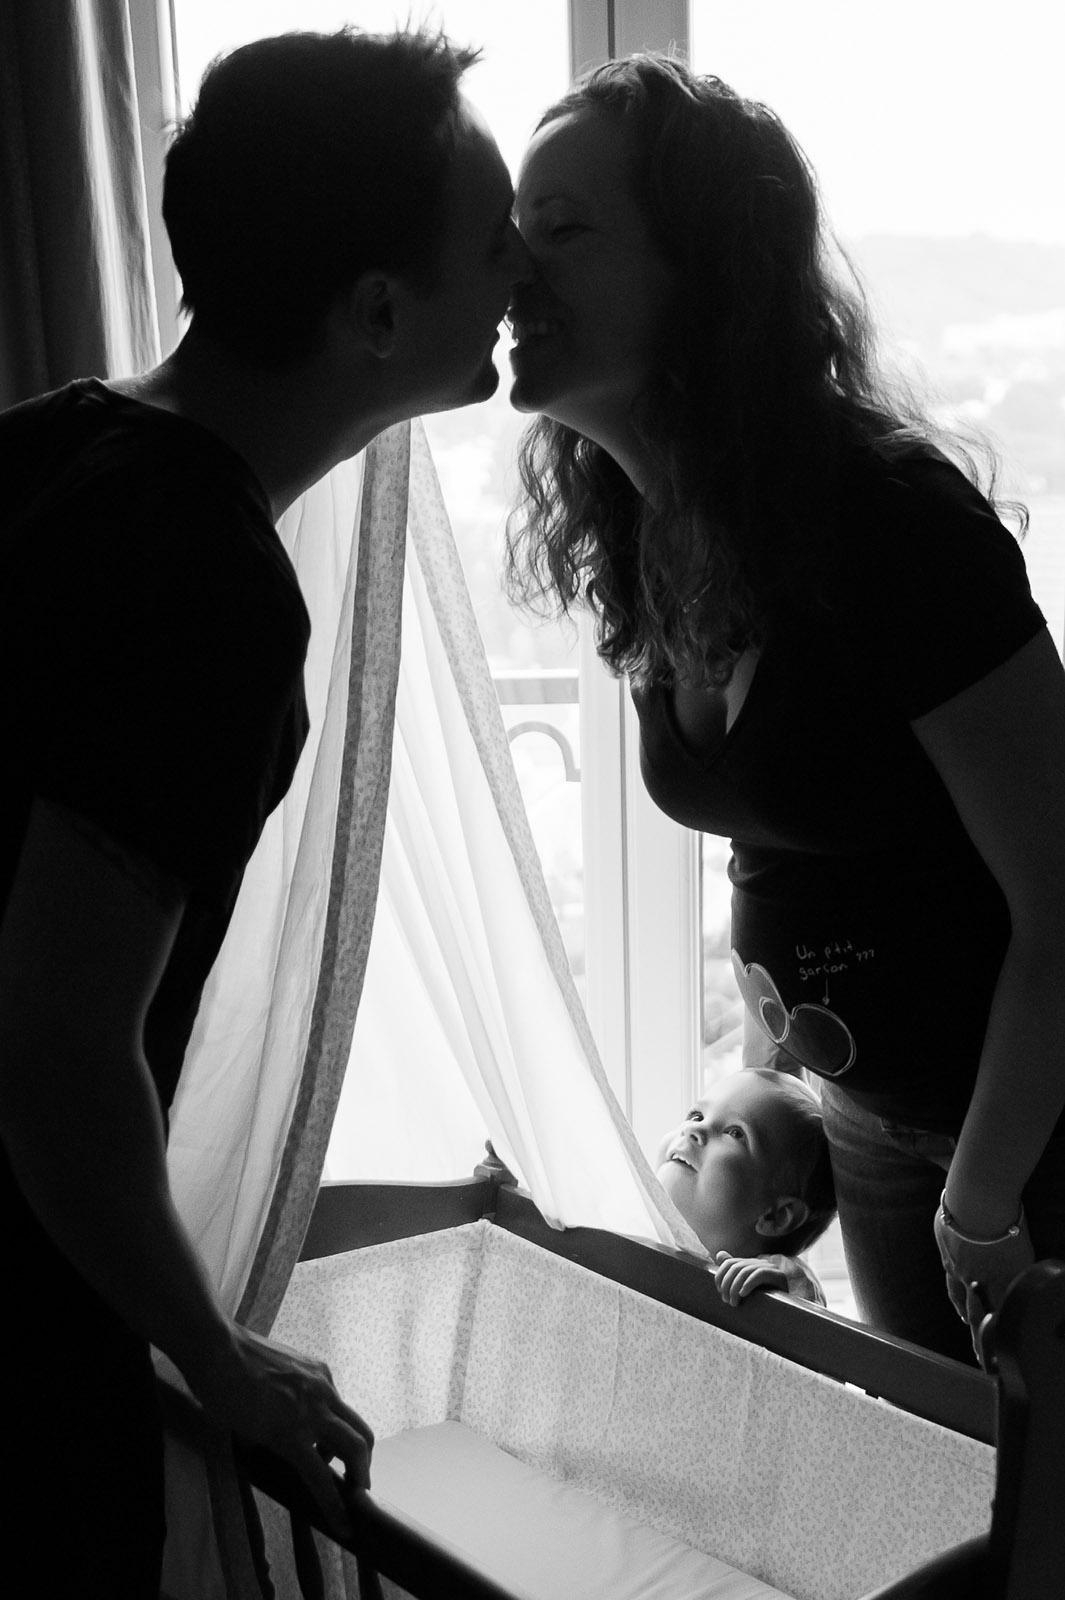 seance-photo-famille-photo-grossesse-photo-bébé-naissance-sabrina-godemert-photographe-seine-et-marne002